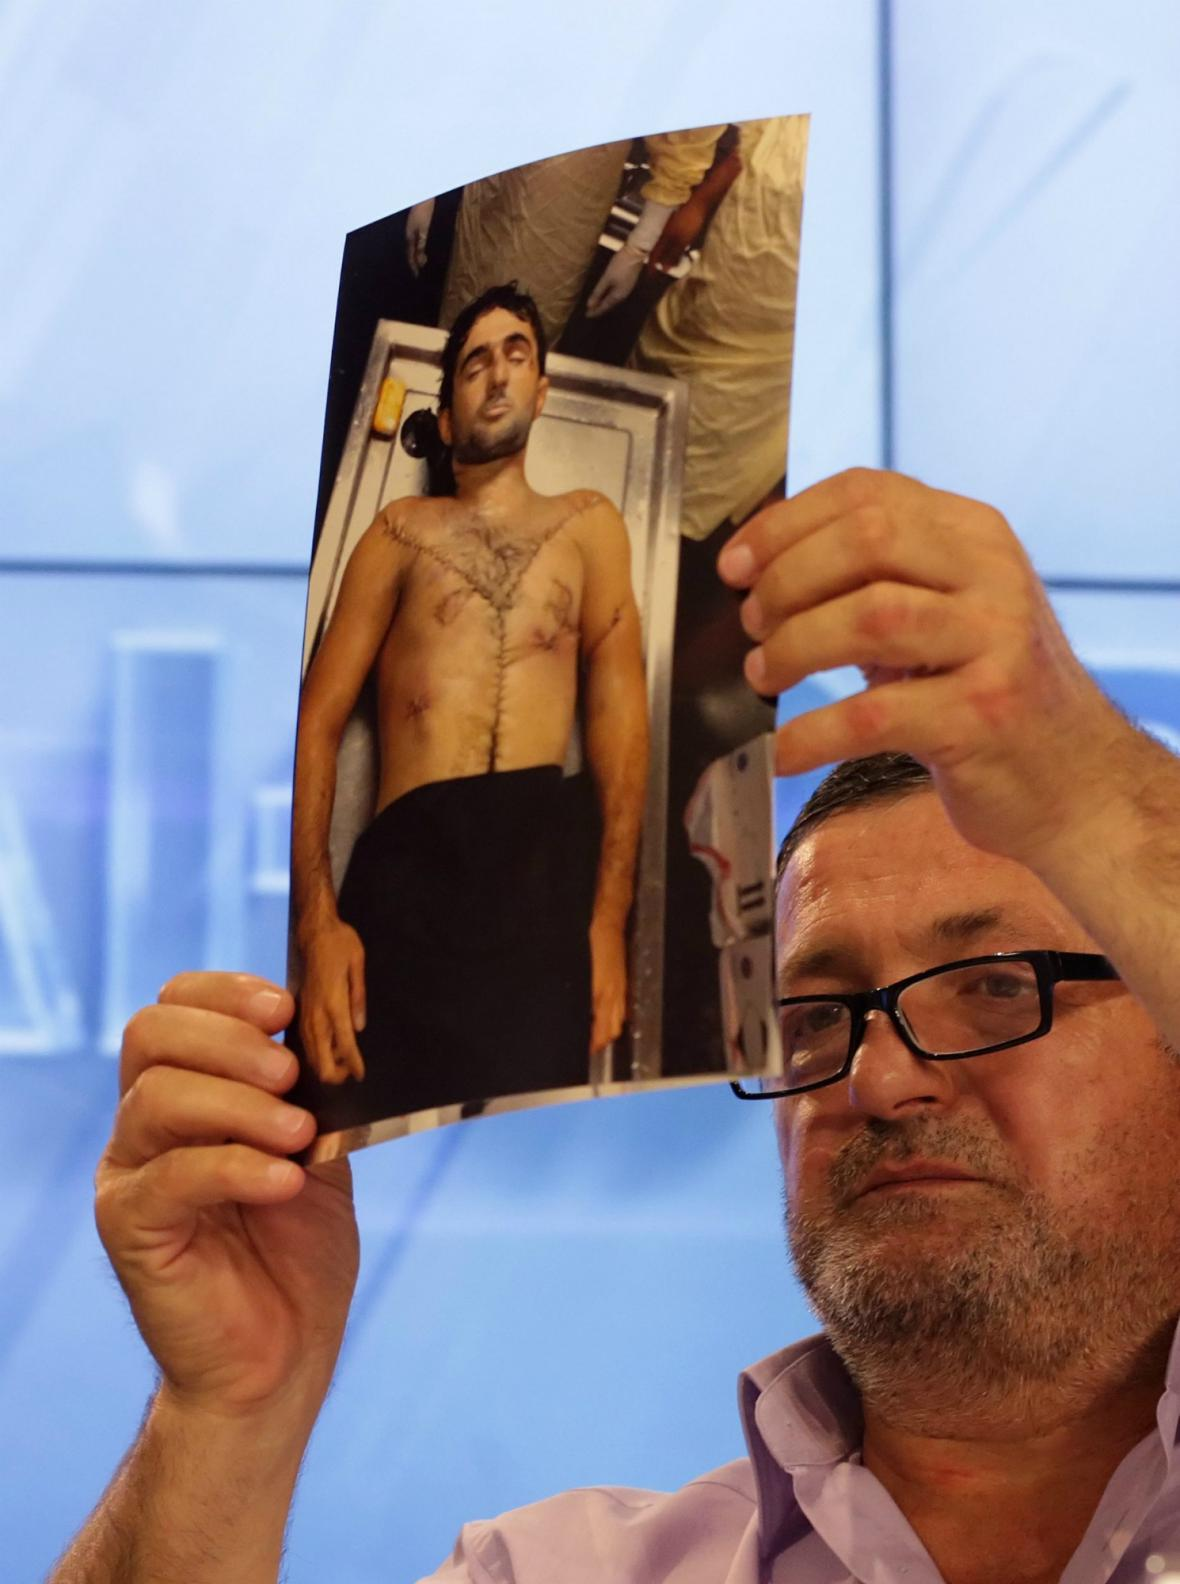 Abdulbaki Todašev ukazuje fotografie svého mrtvého syna